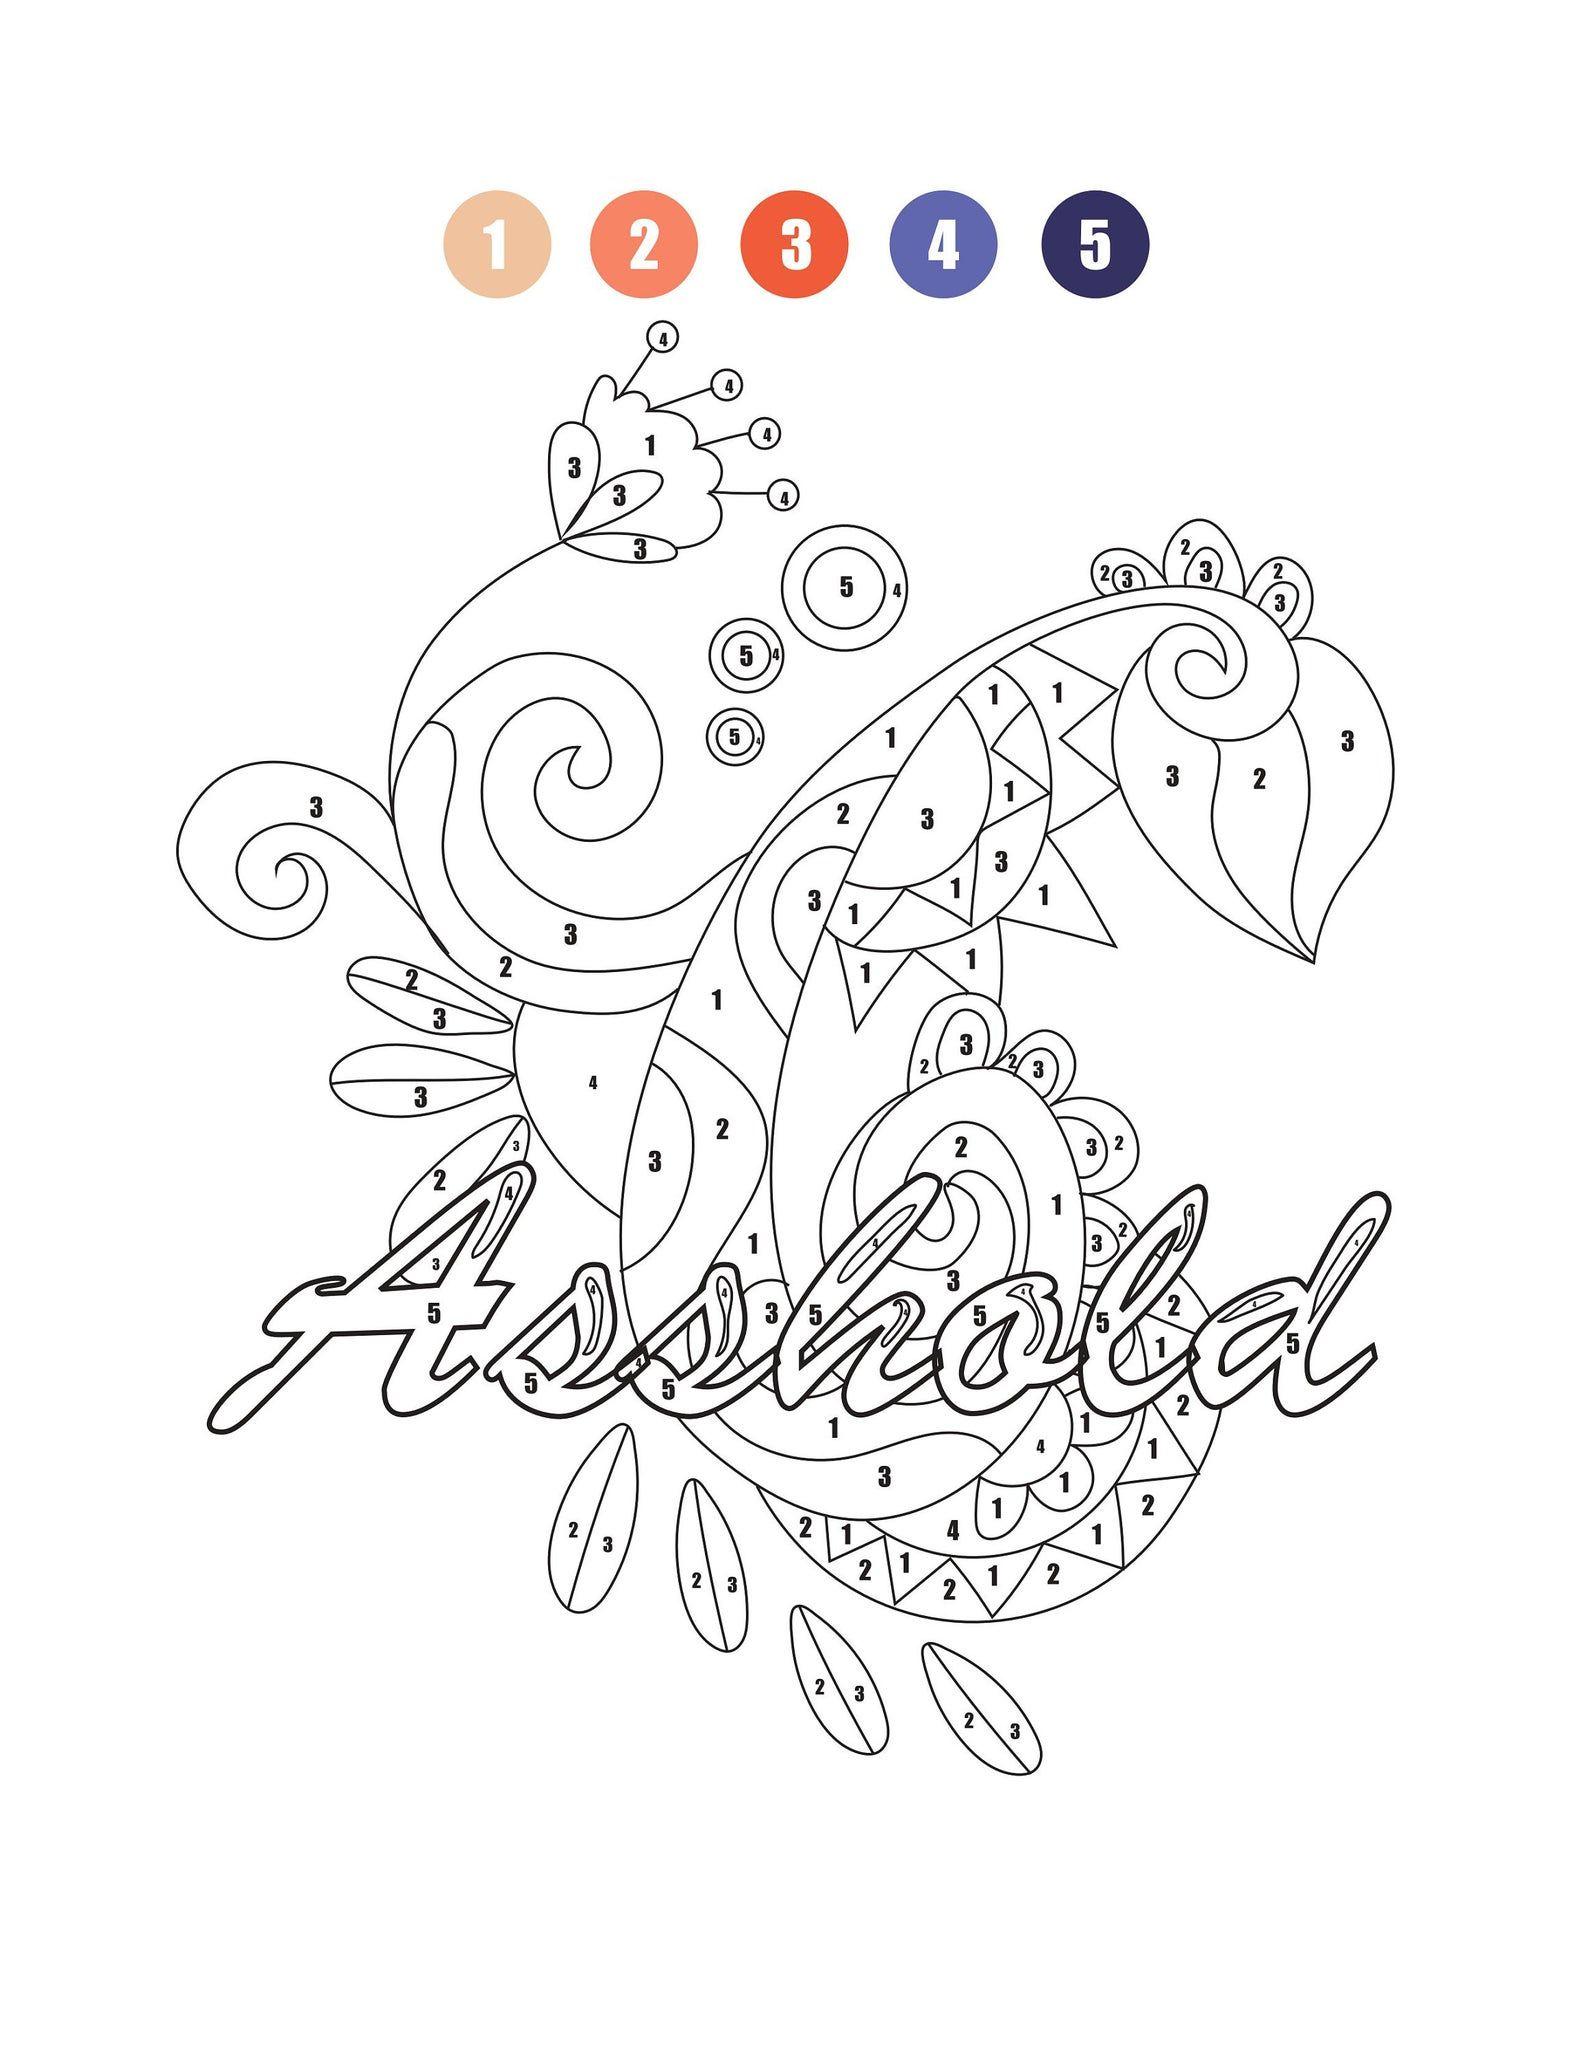 Swear Words Printables Digital Color By Numbers For Adults Etsy Color By Numbers Color By Number Printable Disney Coloring Pages